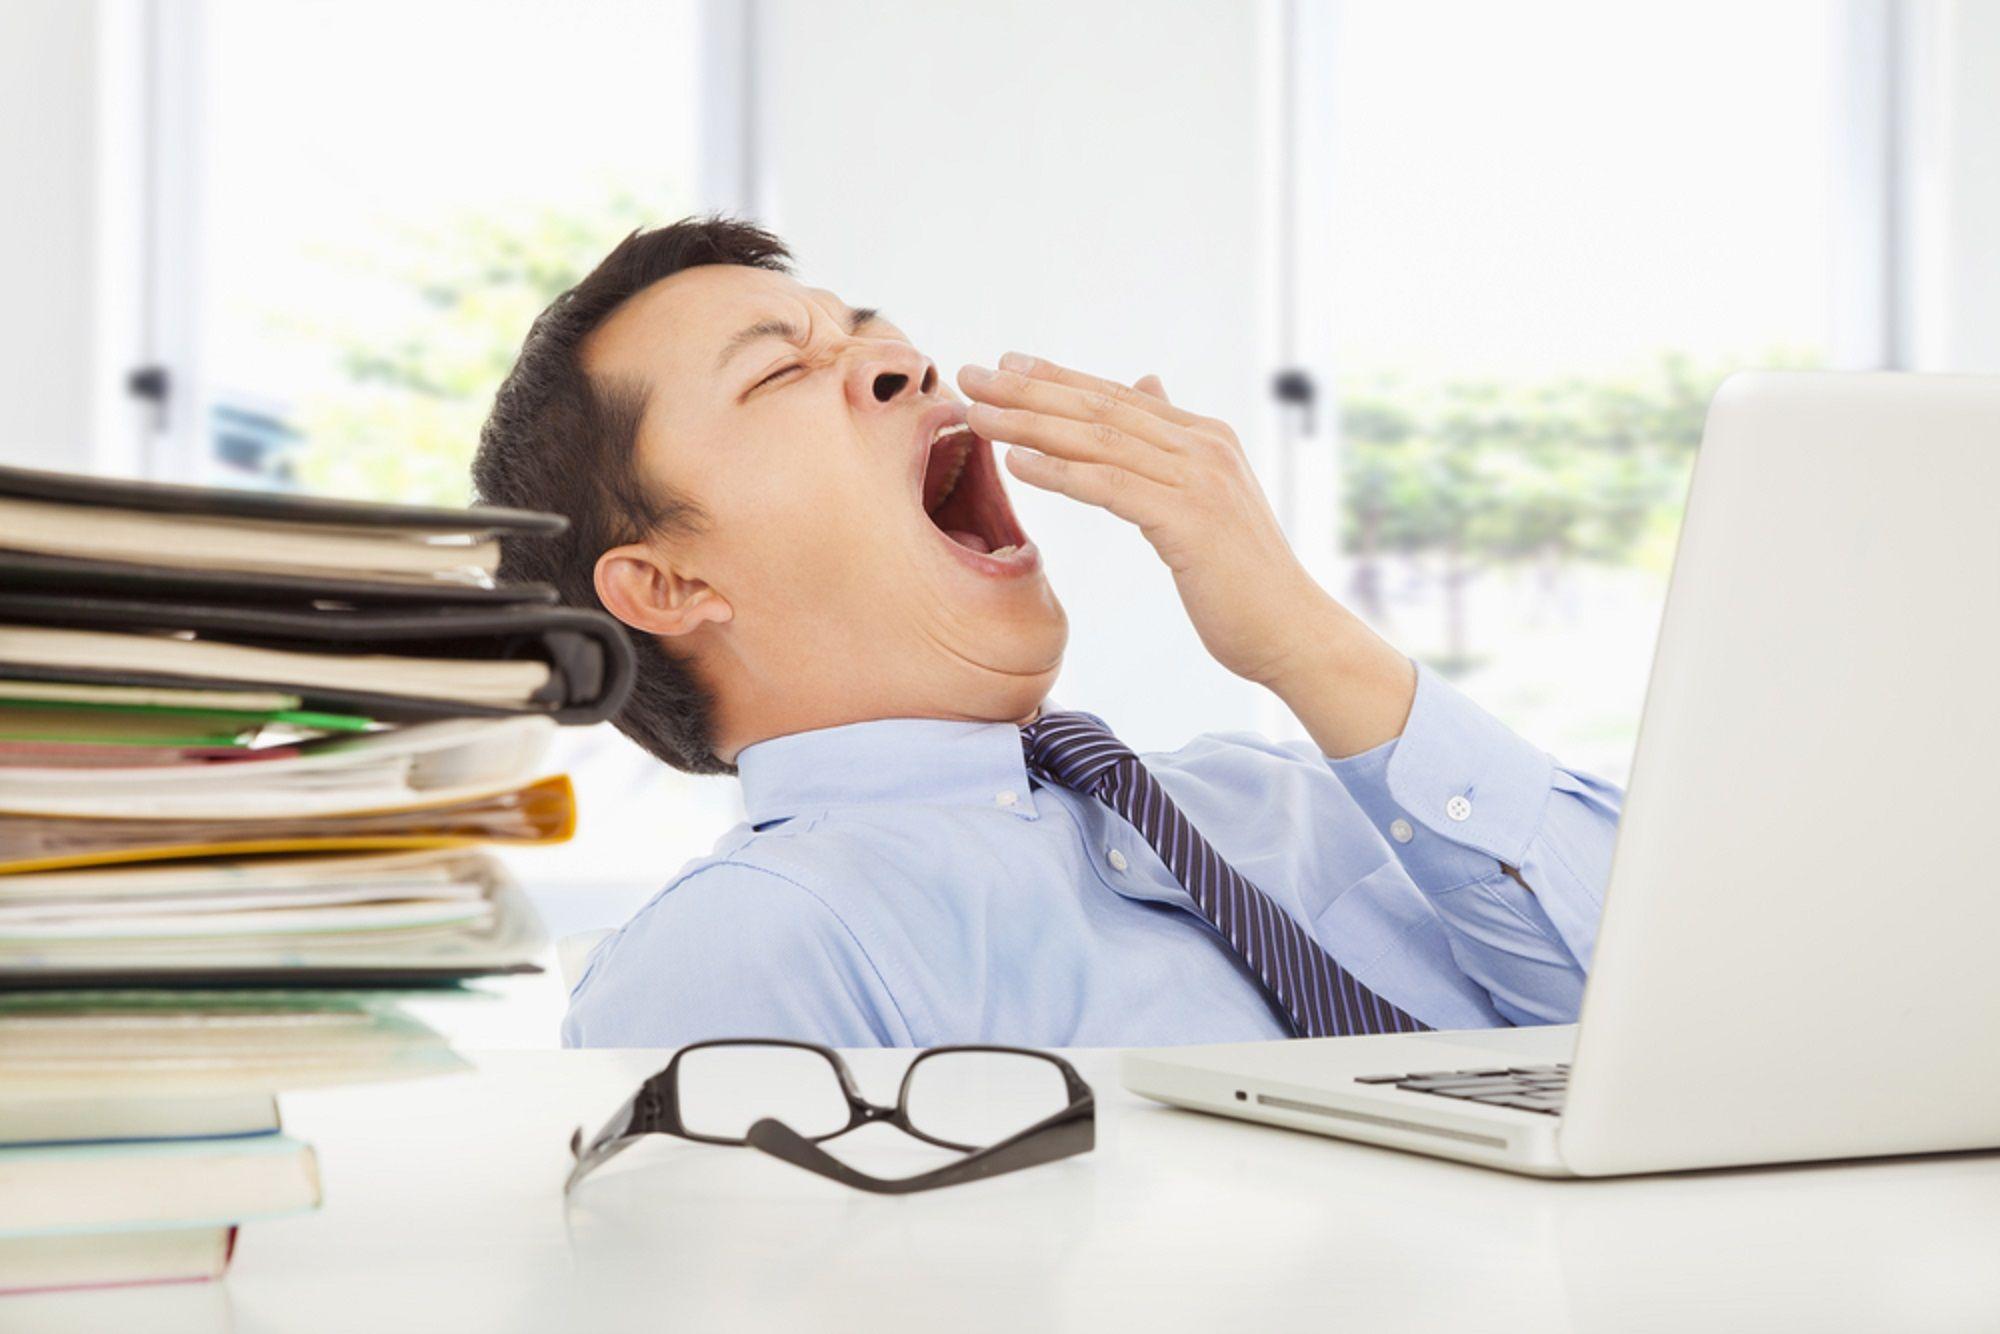 Insólito: demandó a su ex jefe por darle tareas aburridas